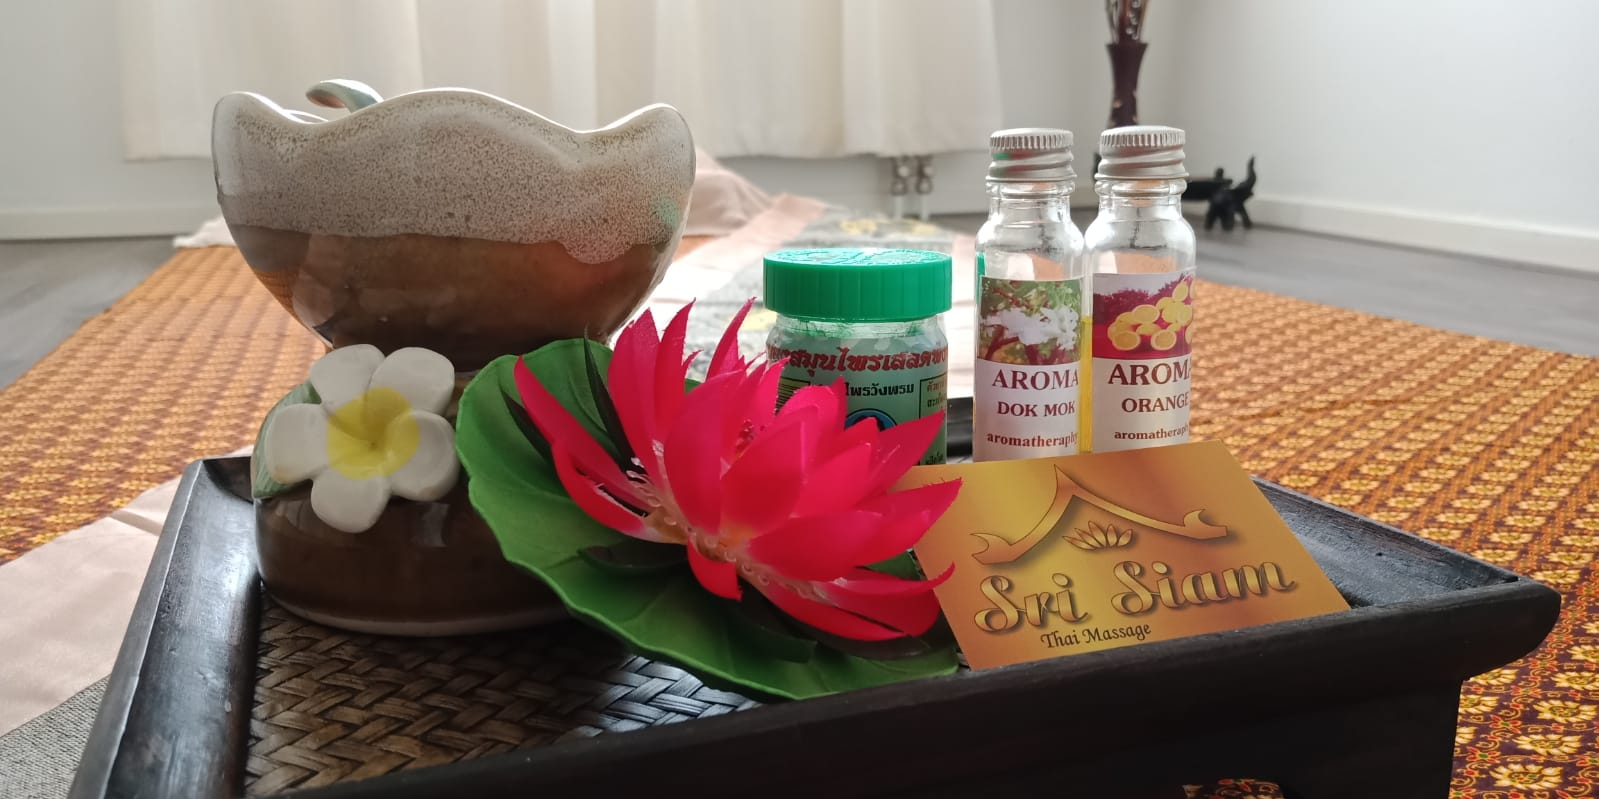 Thaise massage salon in de buurt